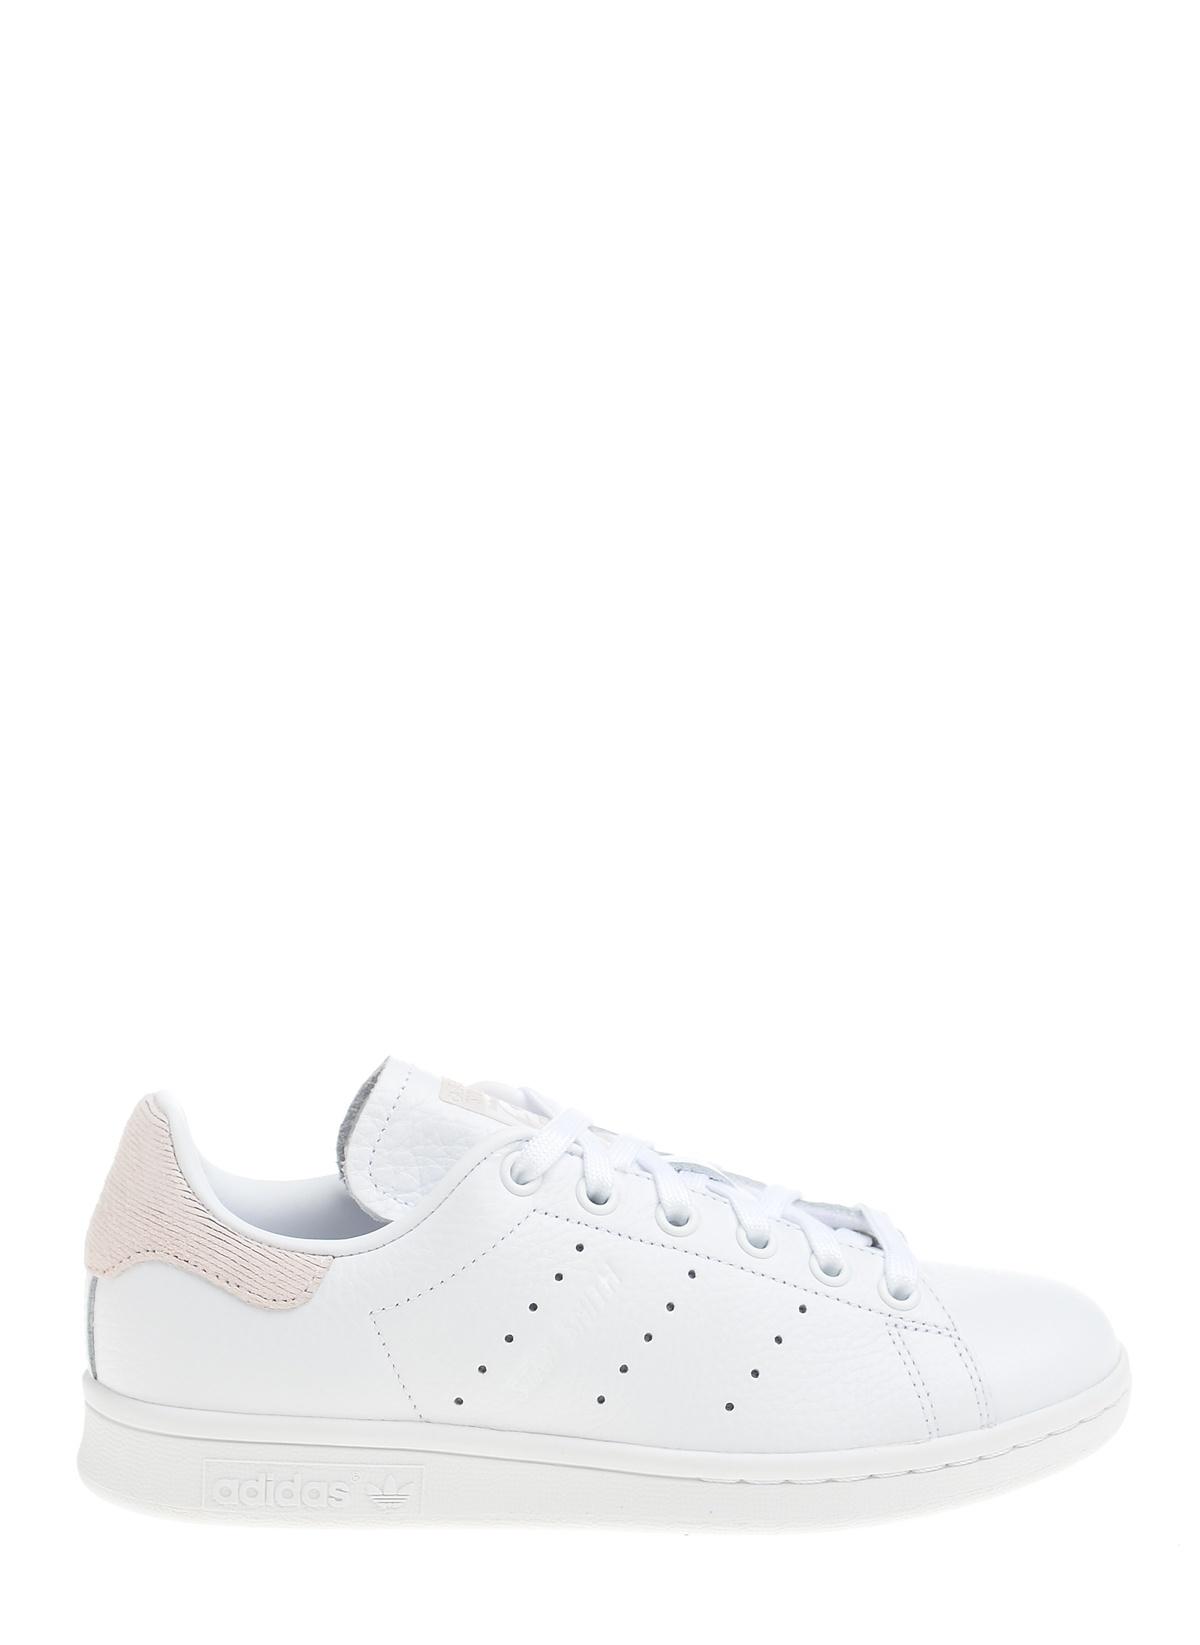 best website 98cb9 e8138 adidas Stan Smith Beyaz · adidas Stan Smith Beyaz ...